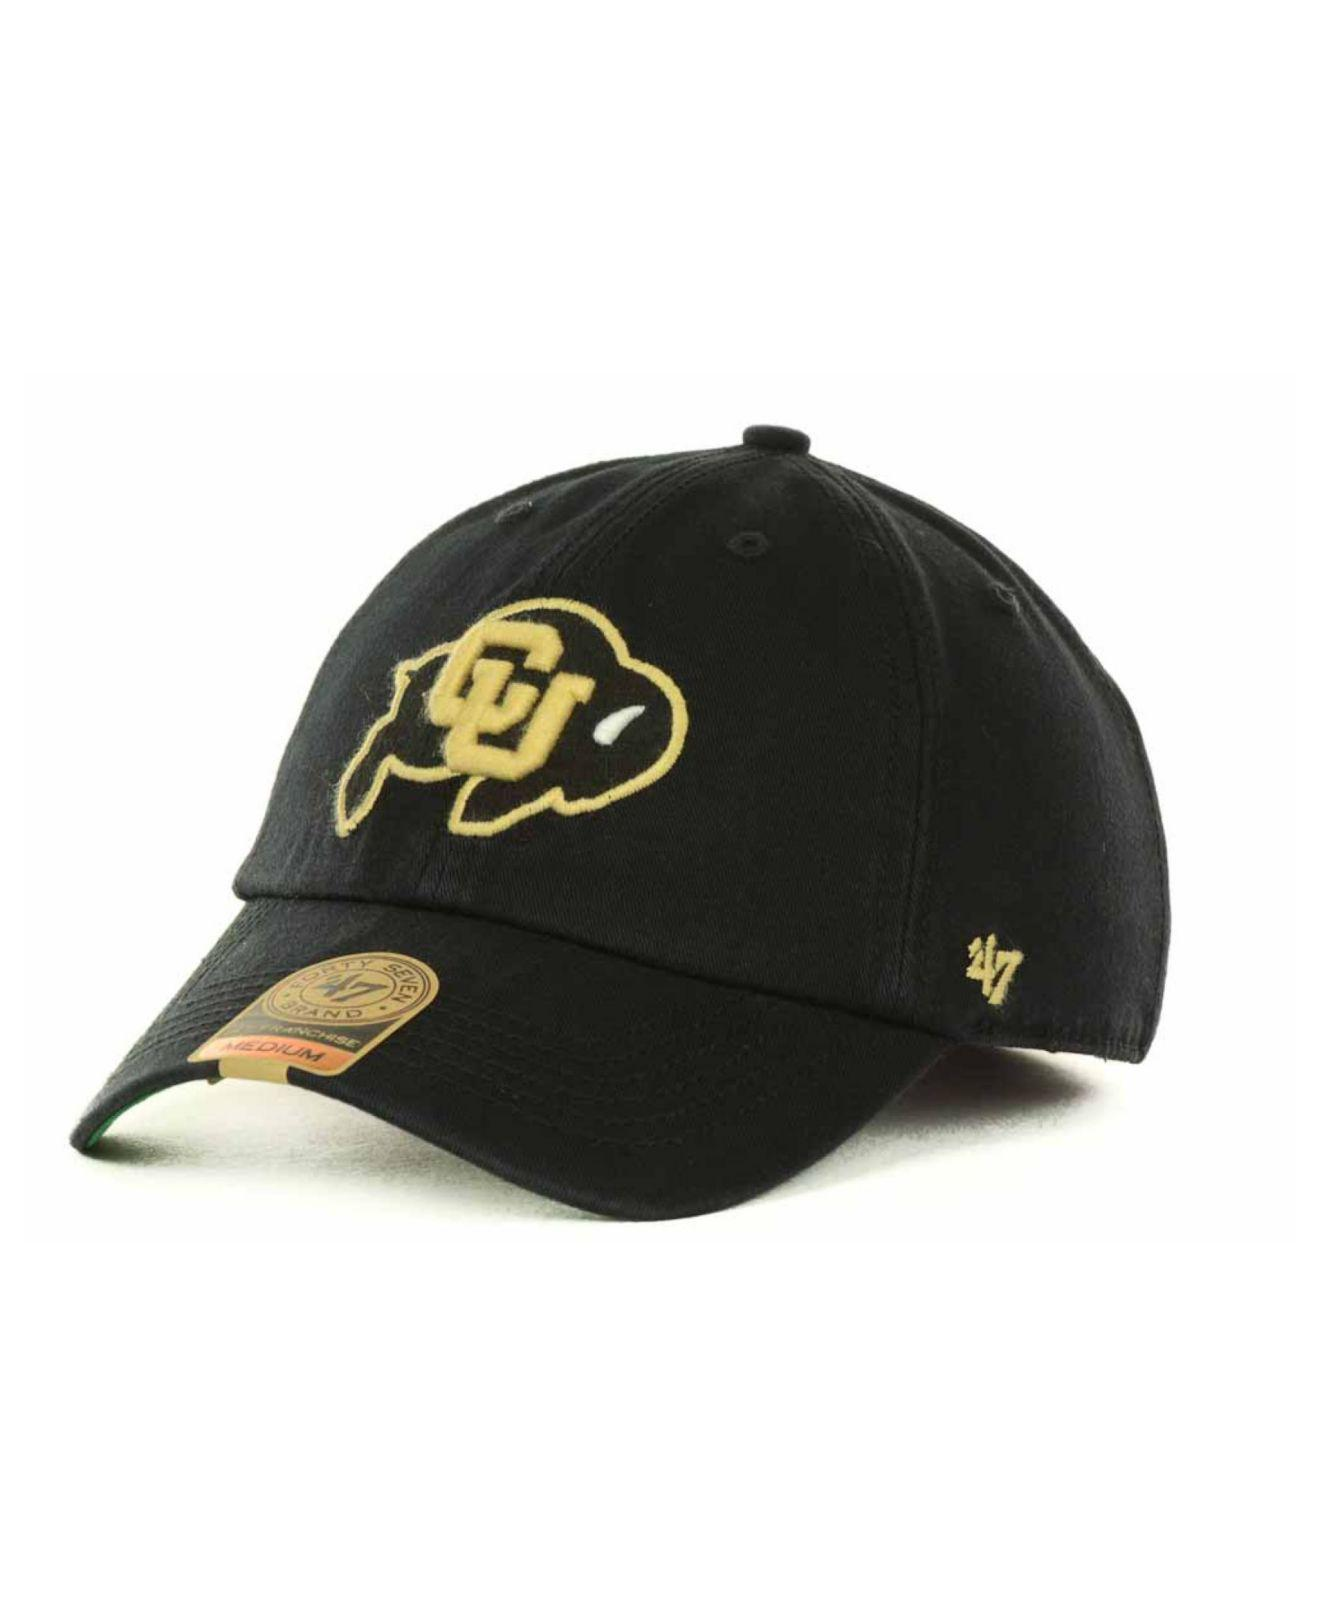 buy online 94de8 42340 47 Brand. Men s Black Colorado Buffaloes Franchise Cap